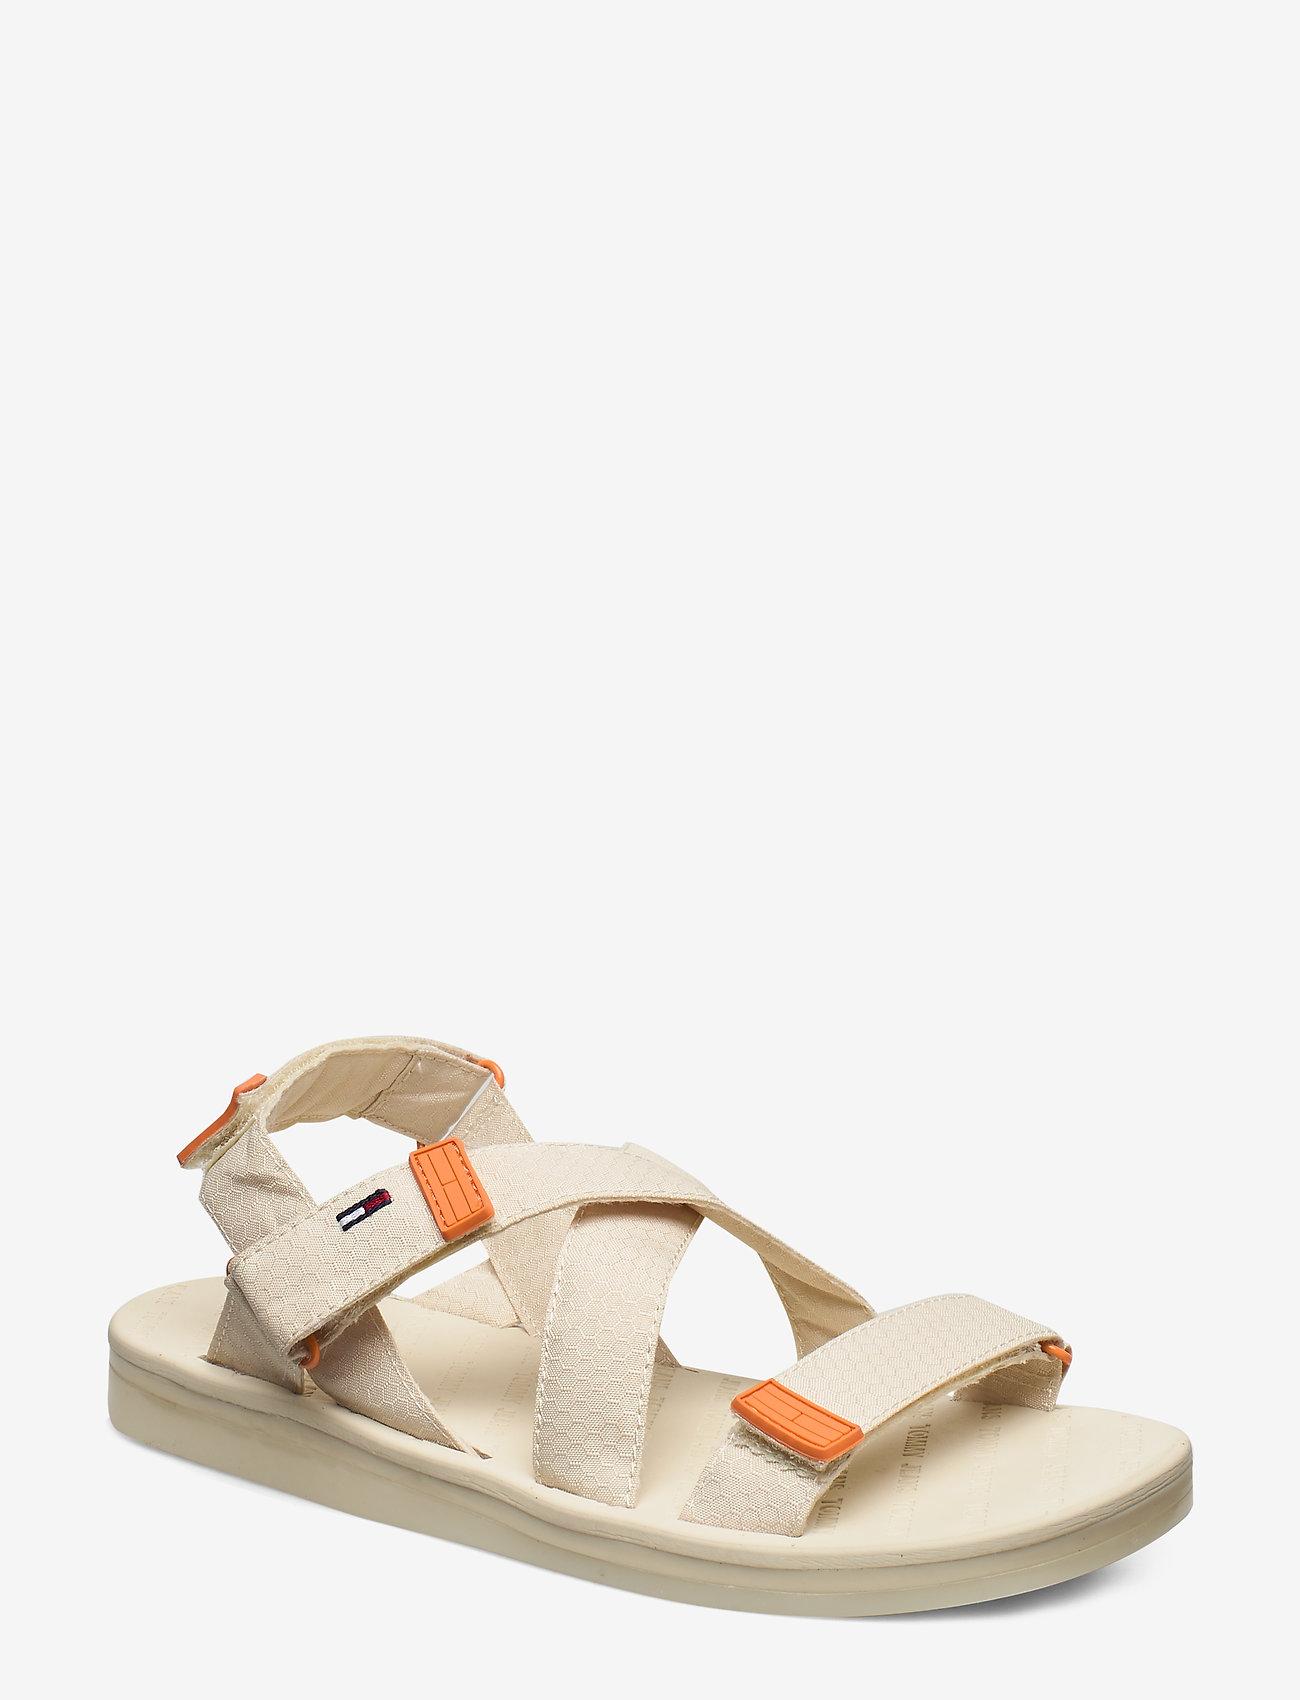 Tommy Hilfiger - TOMMY SURPLUS FLAT SANDAL - flat sandals - light silt - 0